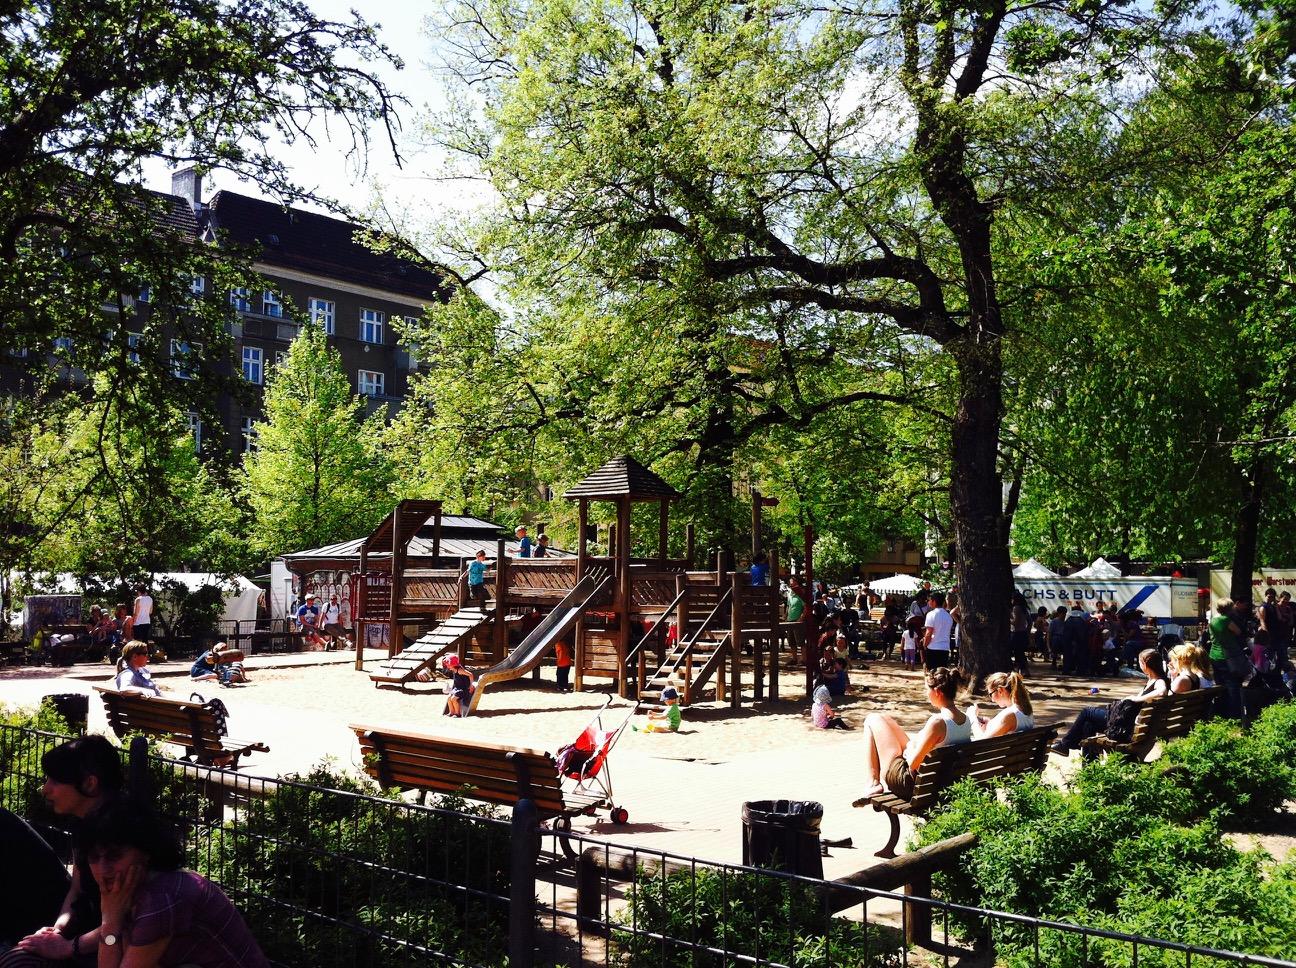 Spielplatz am Boxhagener Platz